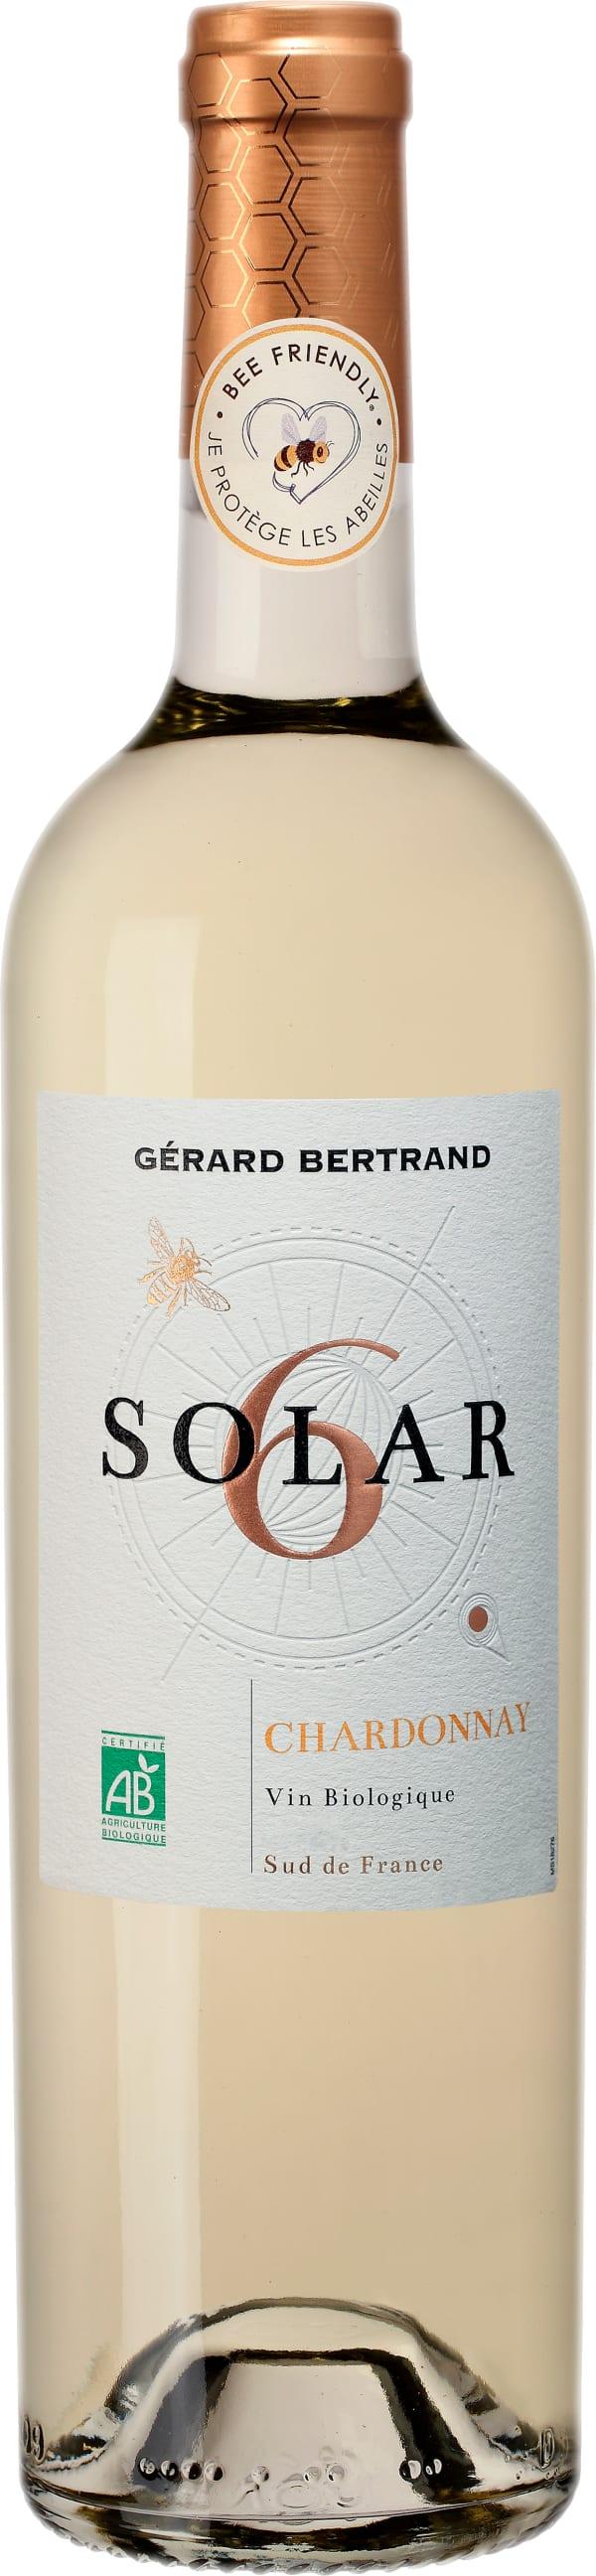 Gérard Bertrand Solar 6 Bee Friendly Chardonnay 2018